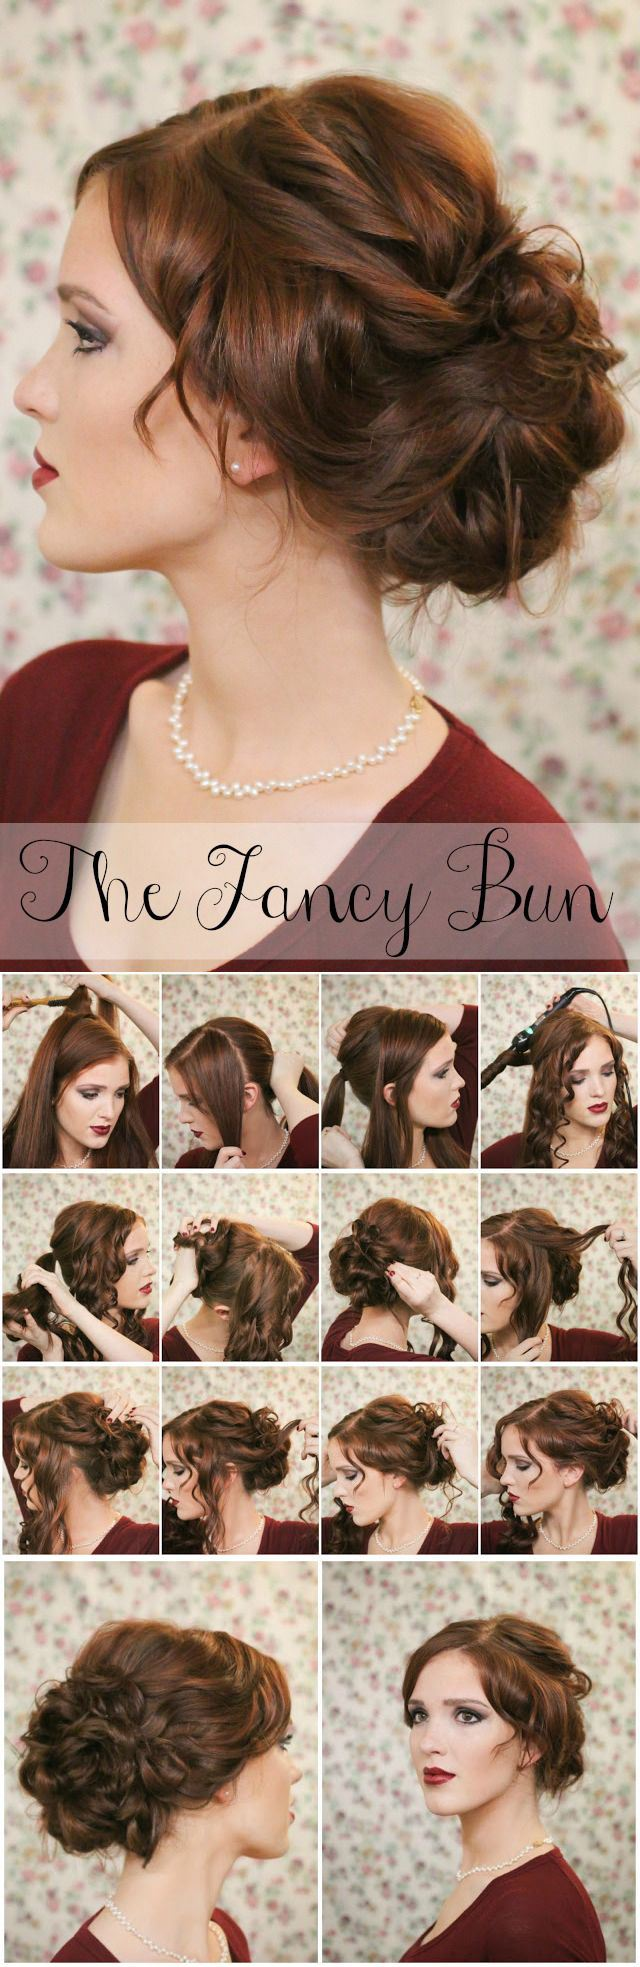 Astonishing Top 25 Messy Hair Bun Tutorials Perfect For Those Lazy Mornings Short Hairstyles For Black Women Fulllsitofus